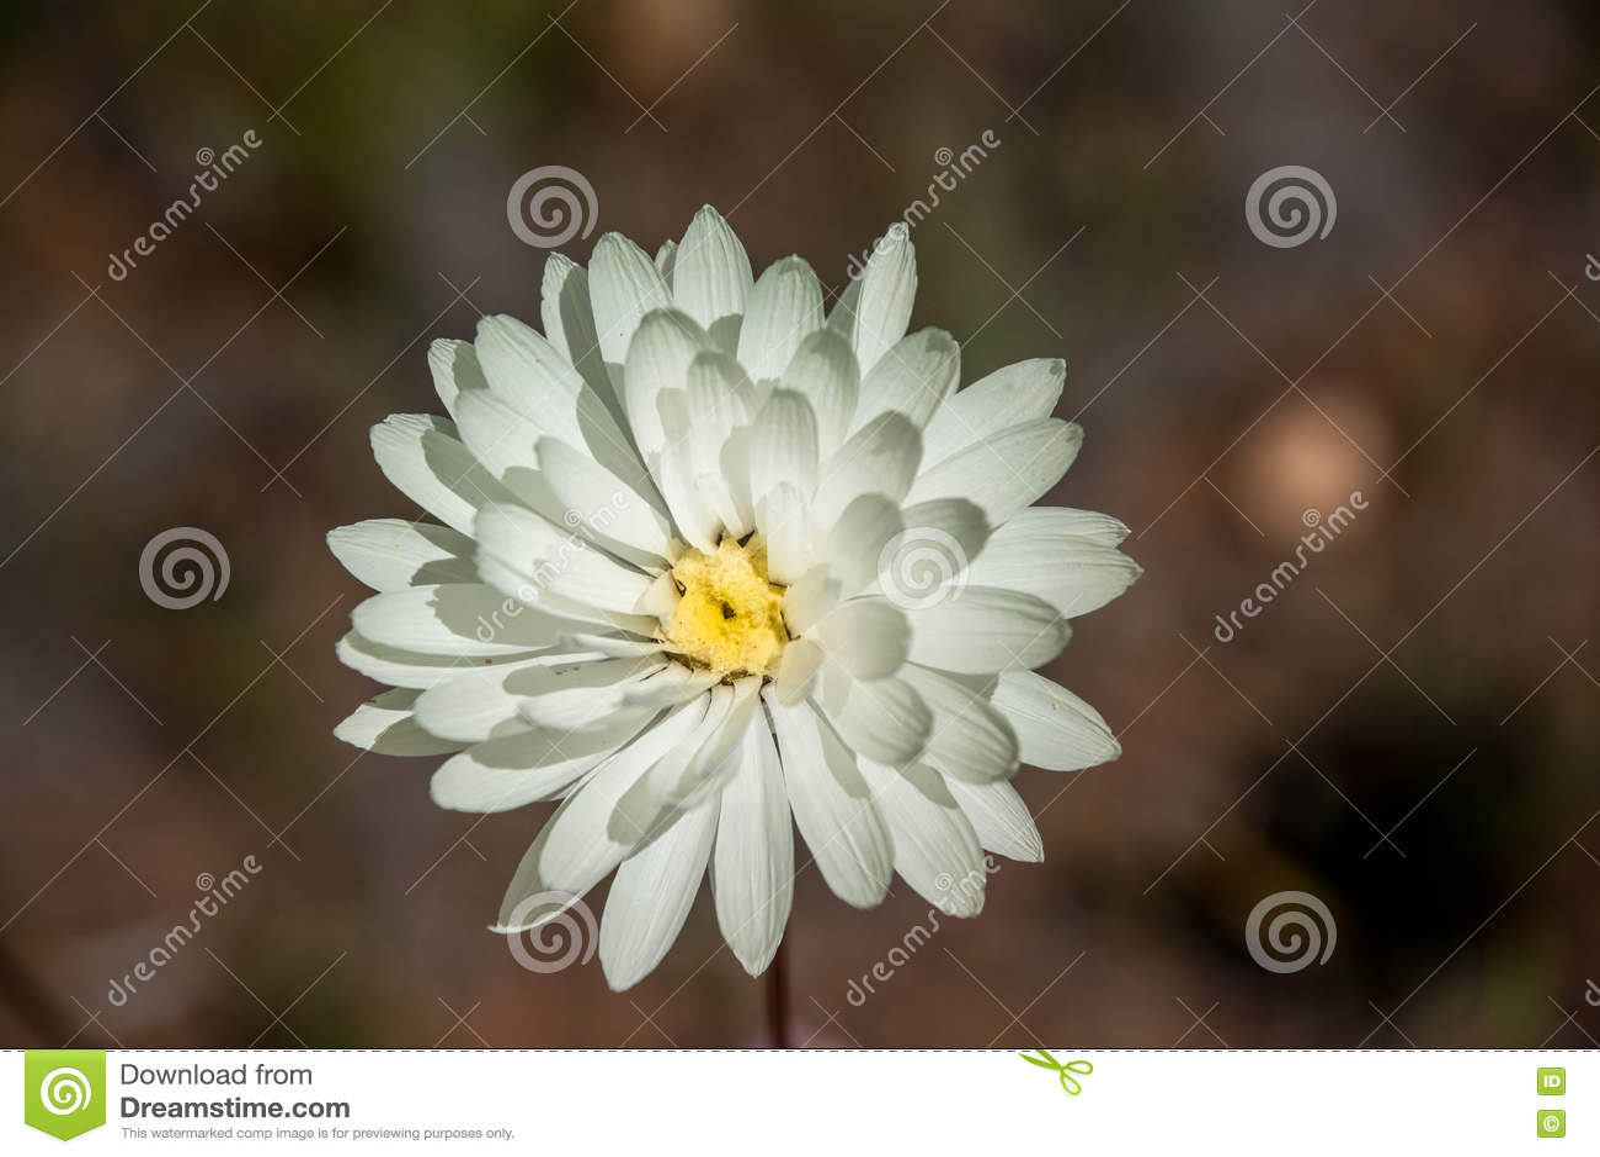 Western Australia Native Wildflower Single White Everlasting Daisy